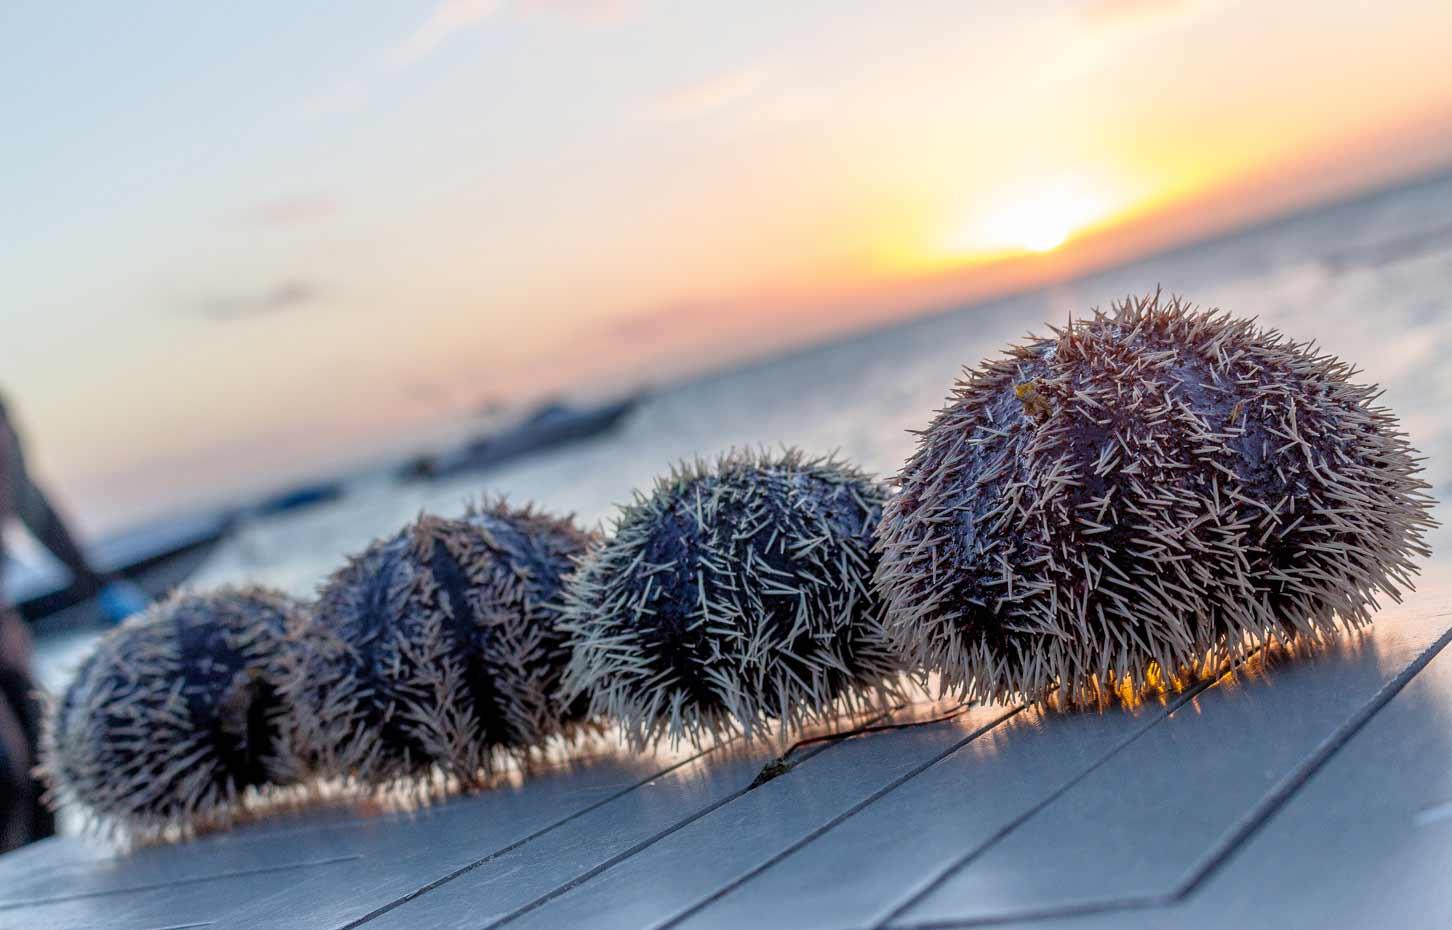 落日,沙滩和新鲜海胆